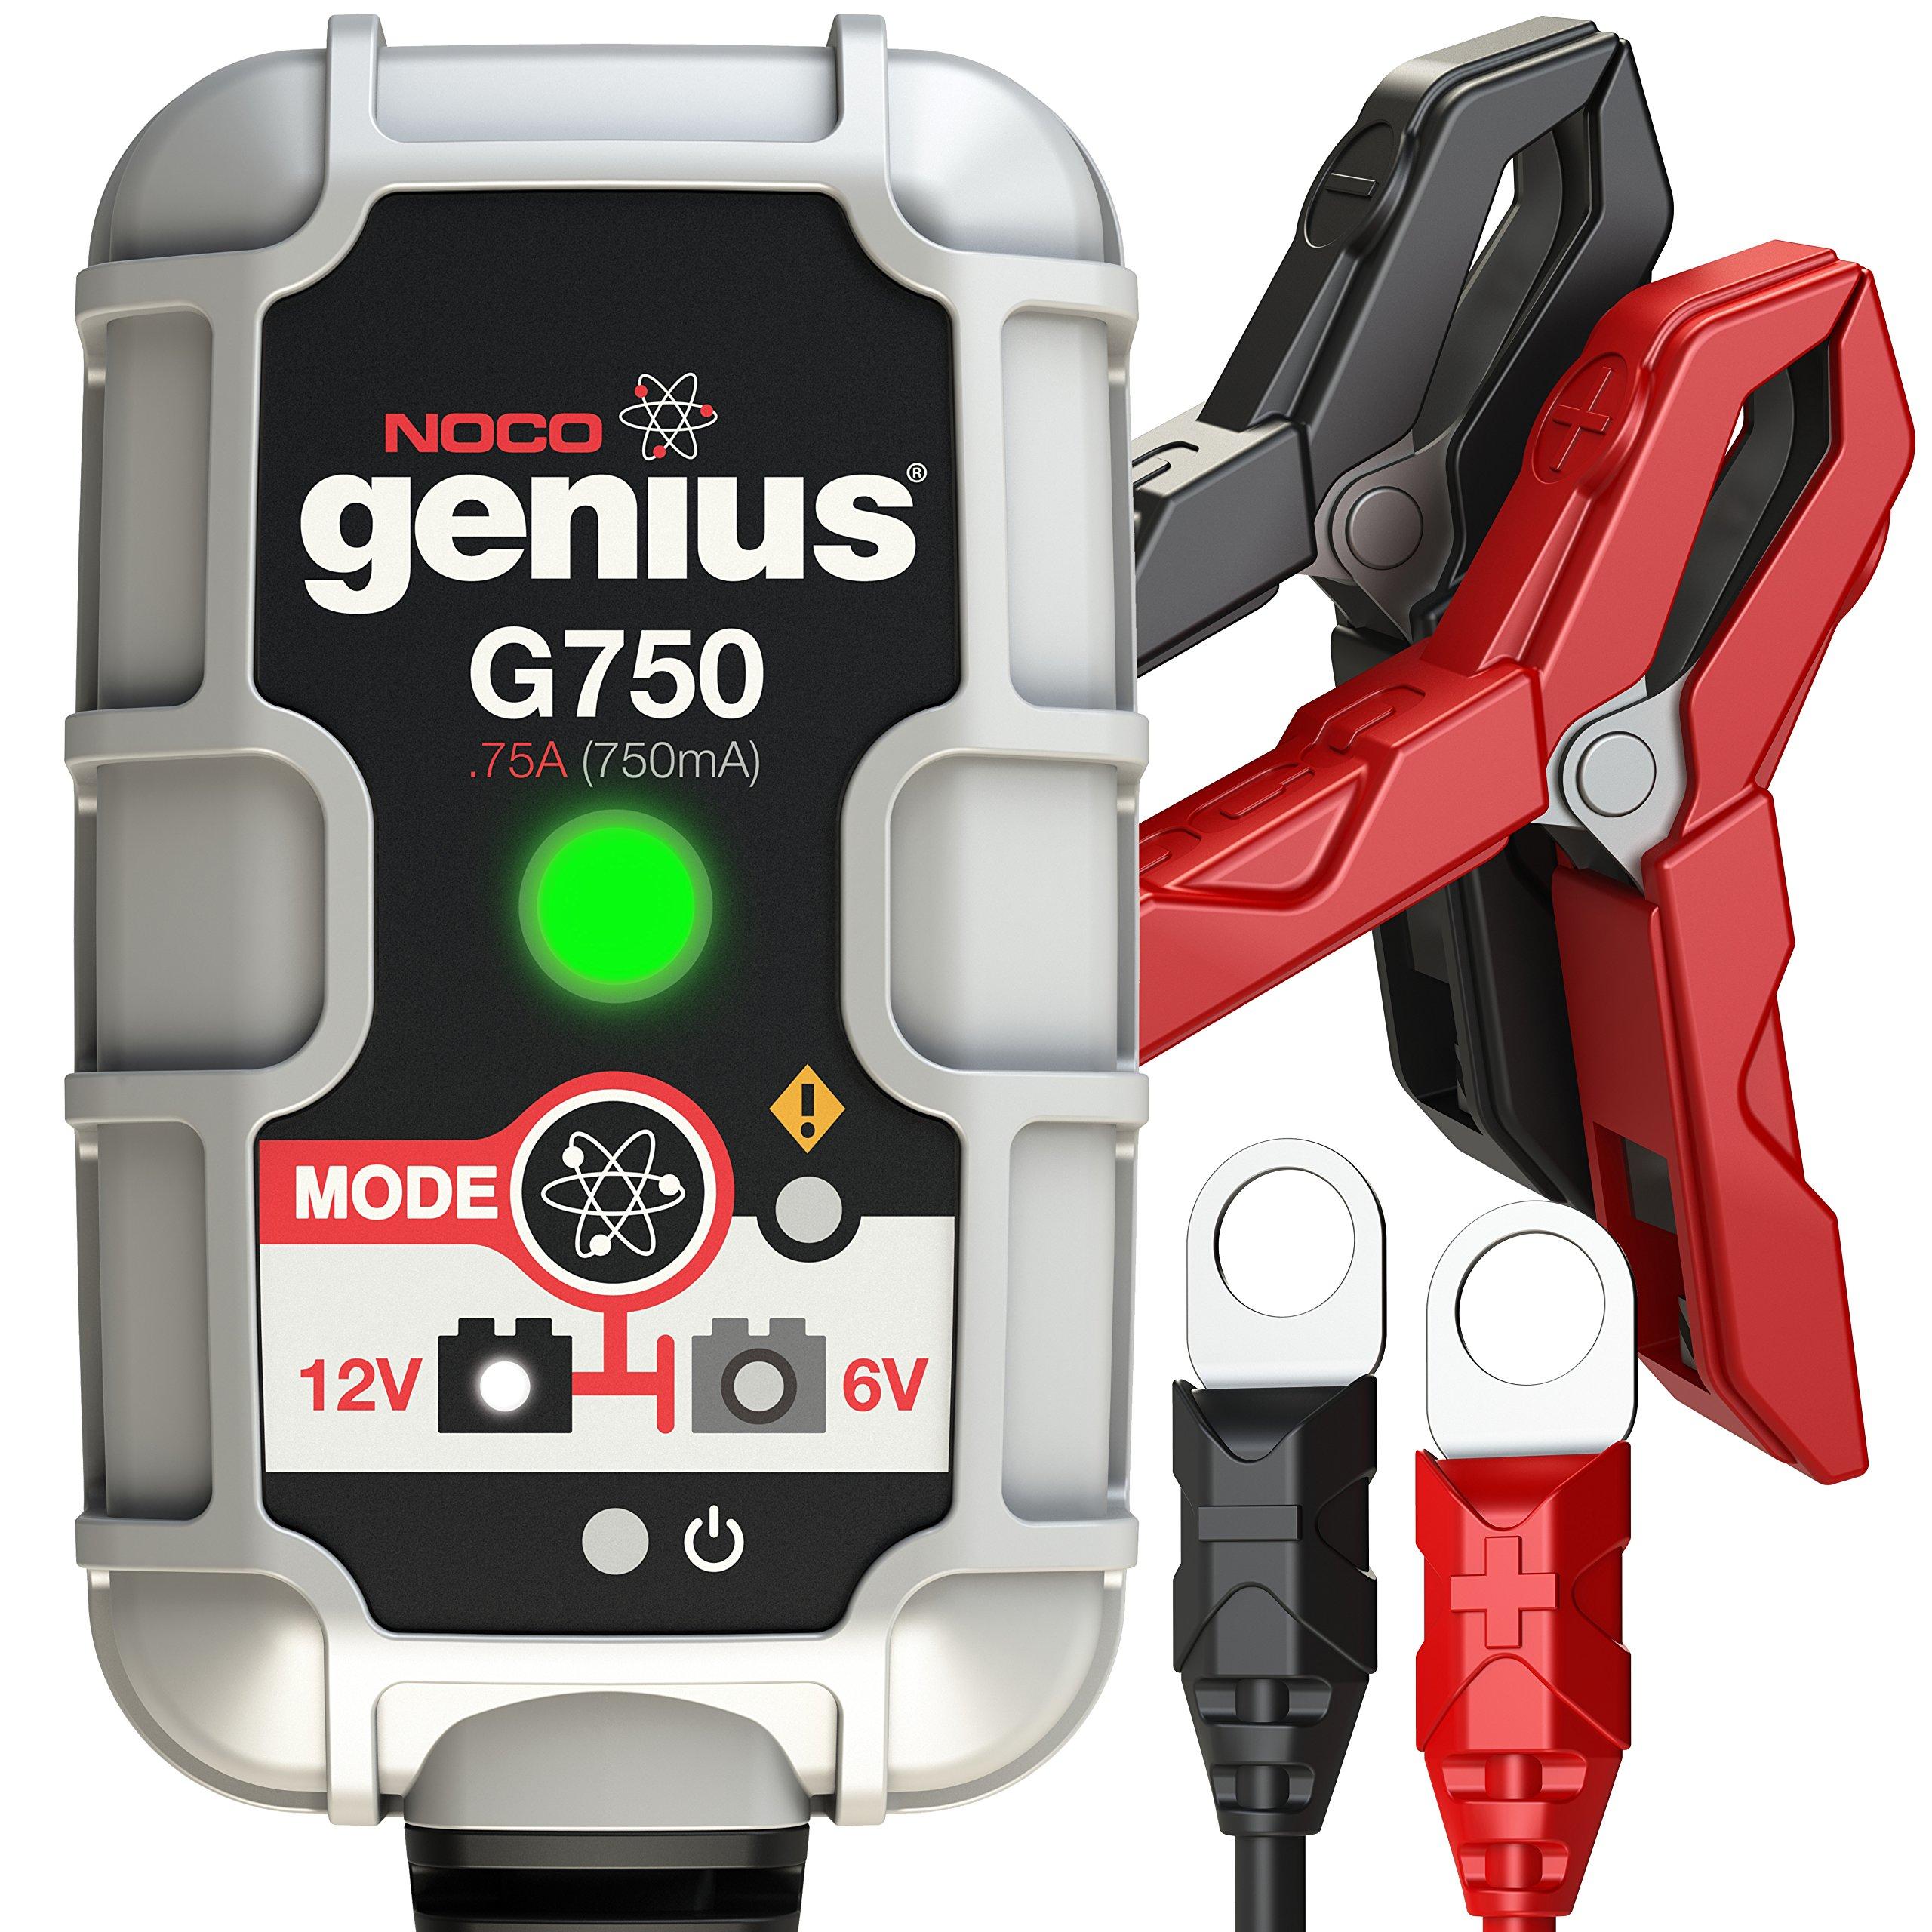 NOCO Genius G750 6V/12V 750mA Battery Charger